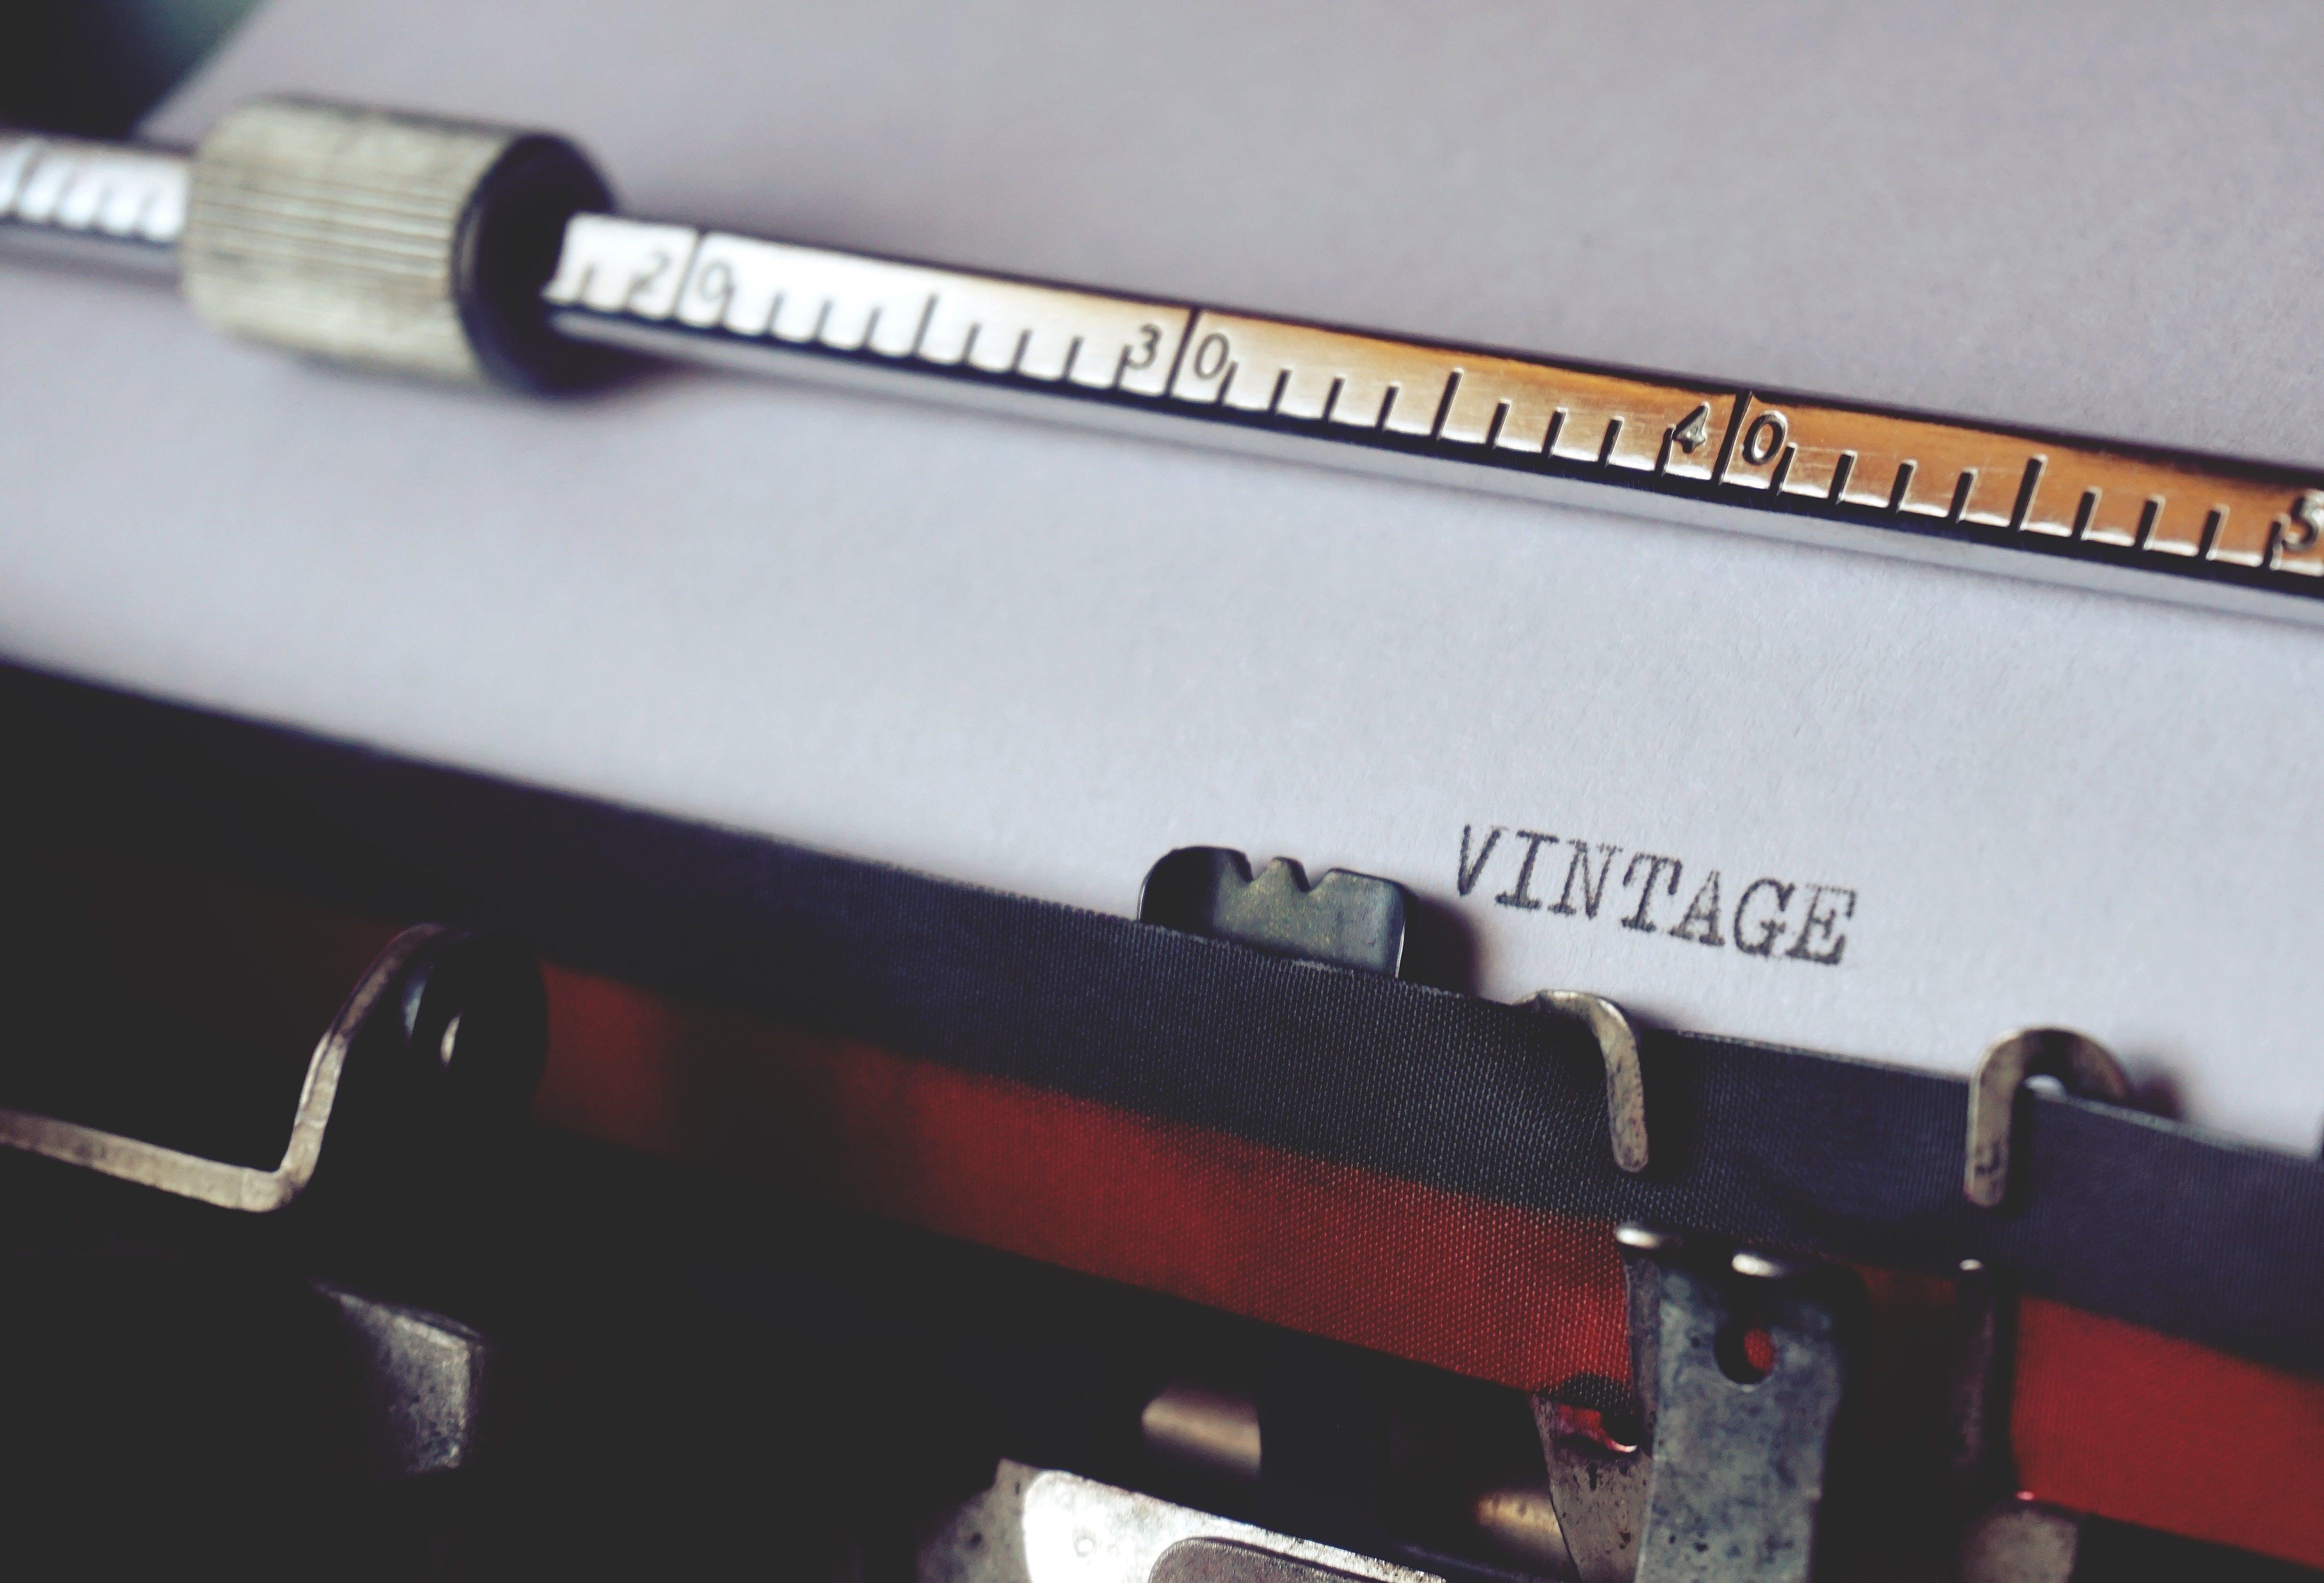 årgang, close-up, gammel skrivemaskine